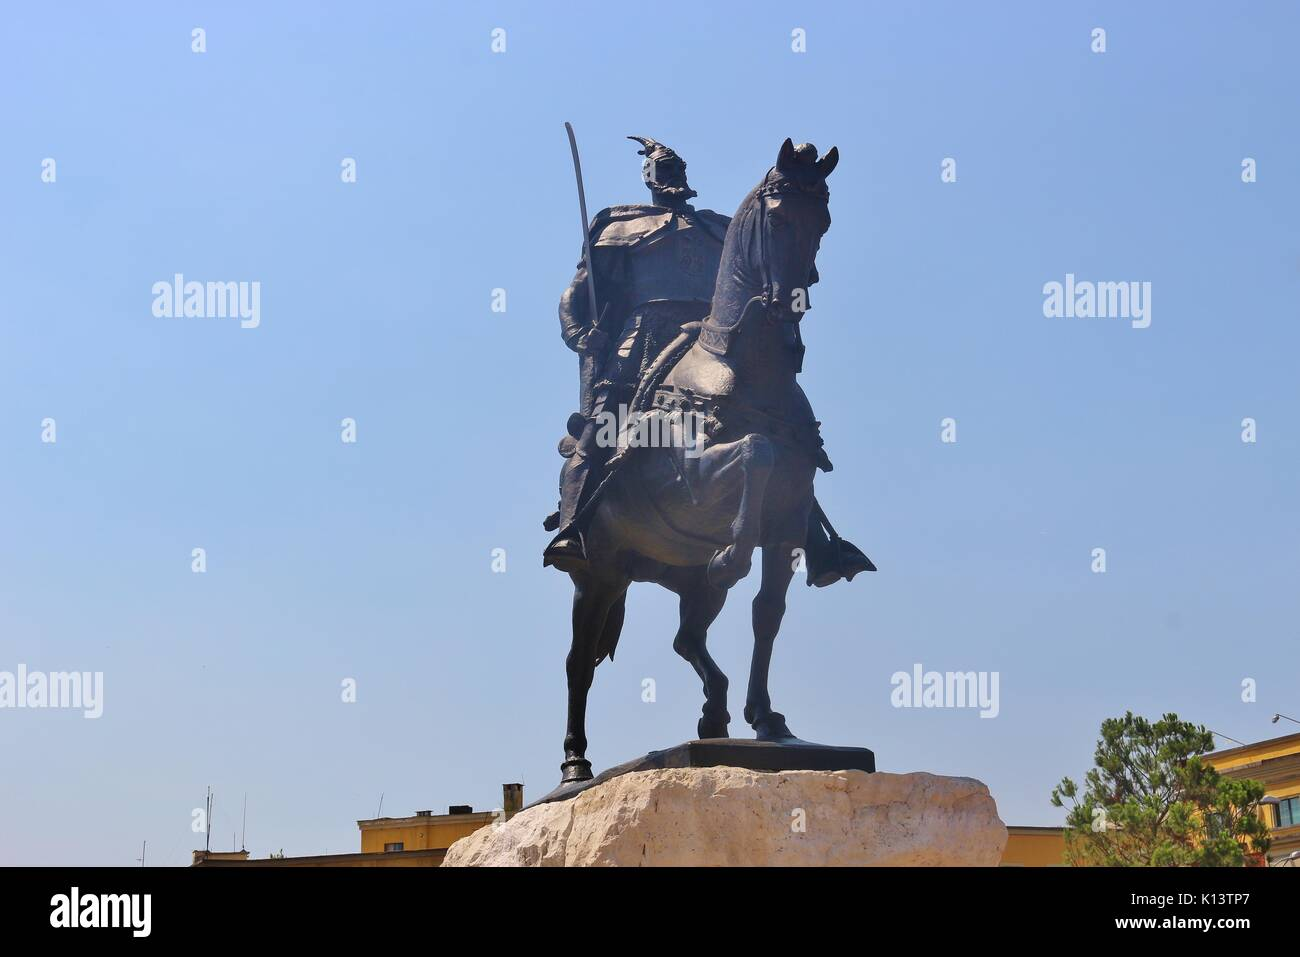 Statue of Skanderbeg or Gjergj Kastrioti who fought against the empire in the 15th century. Skanderbeg square in the center of Tirana, Albania, Europe. - Stock Image